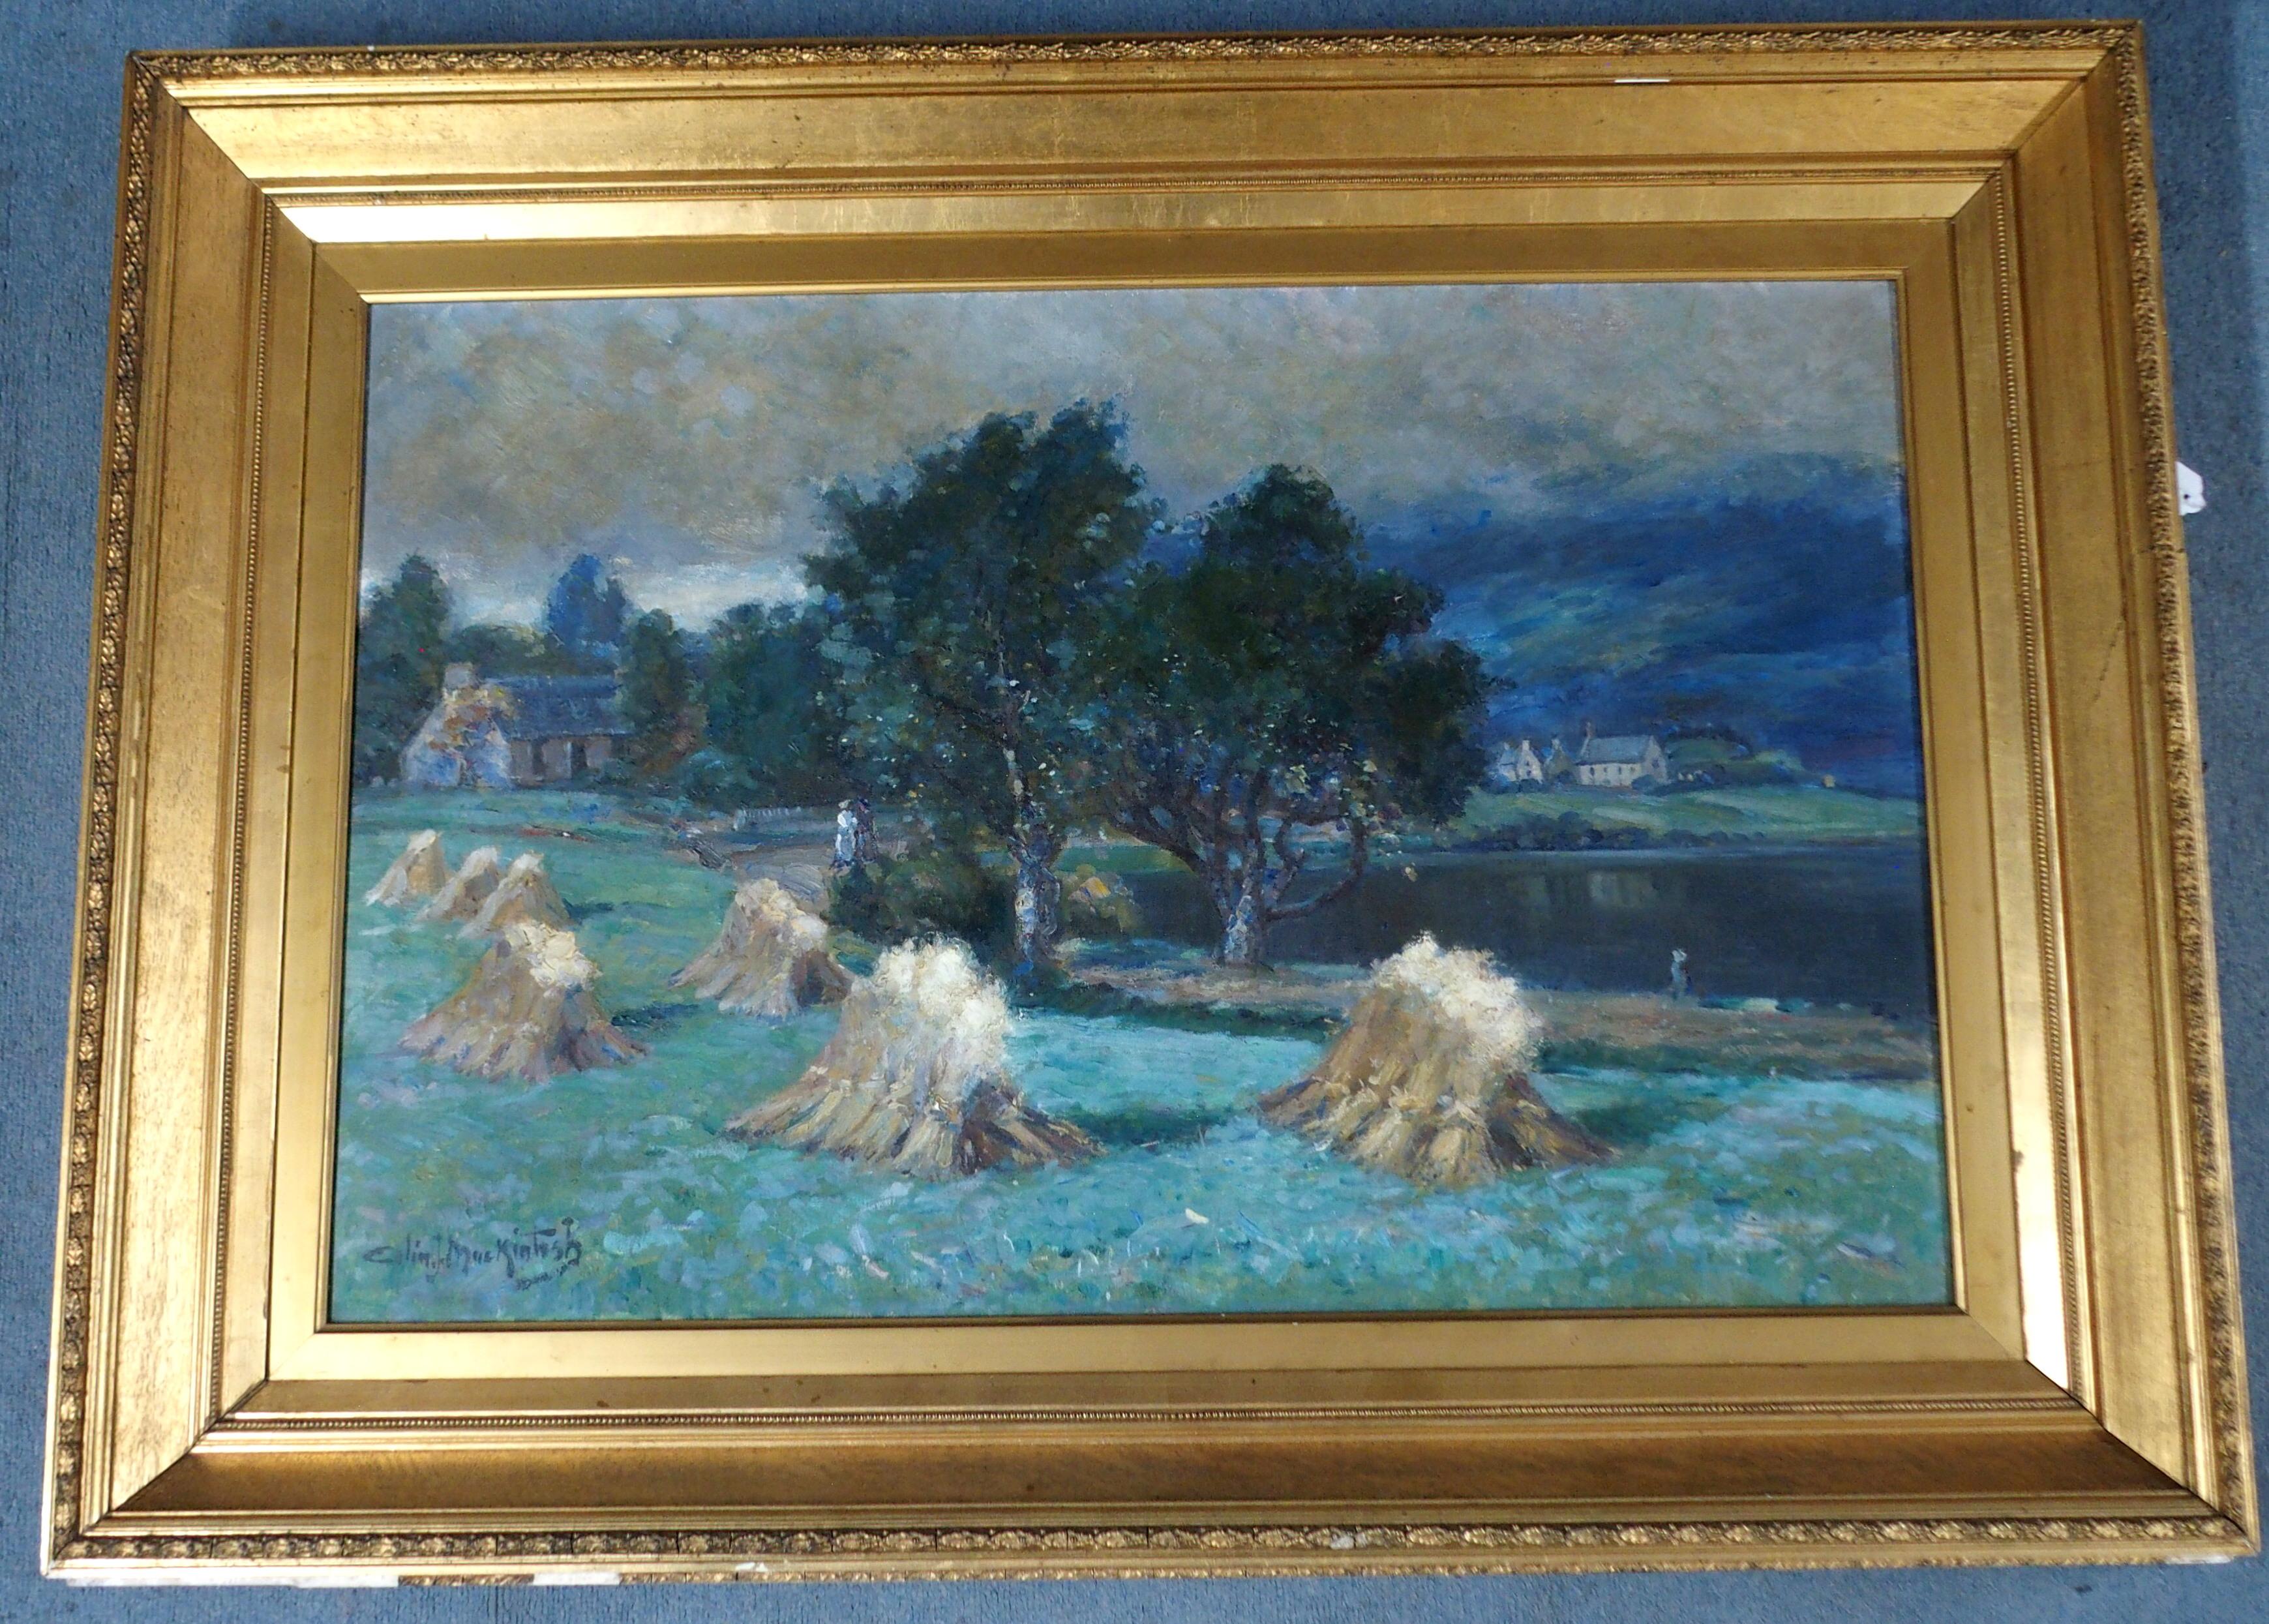 COLIN JOHN MACKINTOSH (SCOTTISH 1866-1910) CORN STOOKS, LOCH ALVIE Oil on canvas, signed, 61 x 91. - Image 2 of 6